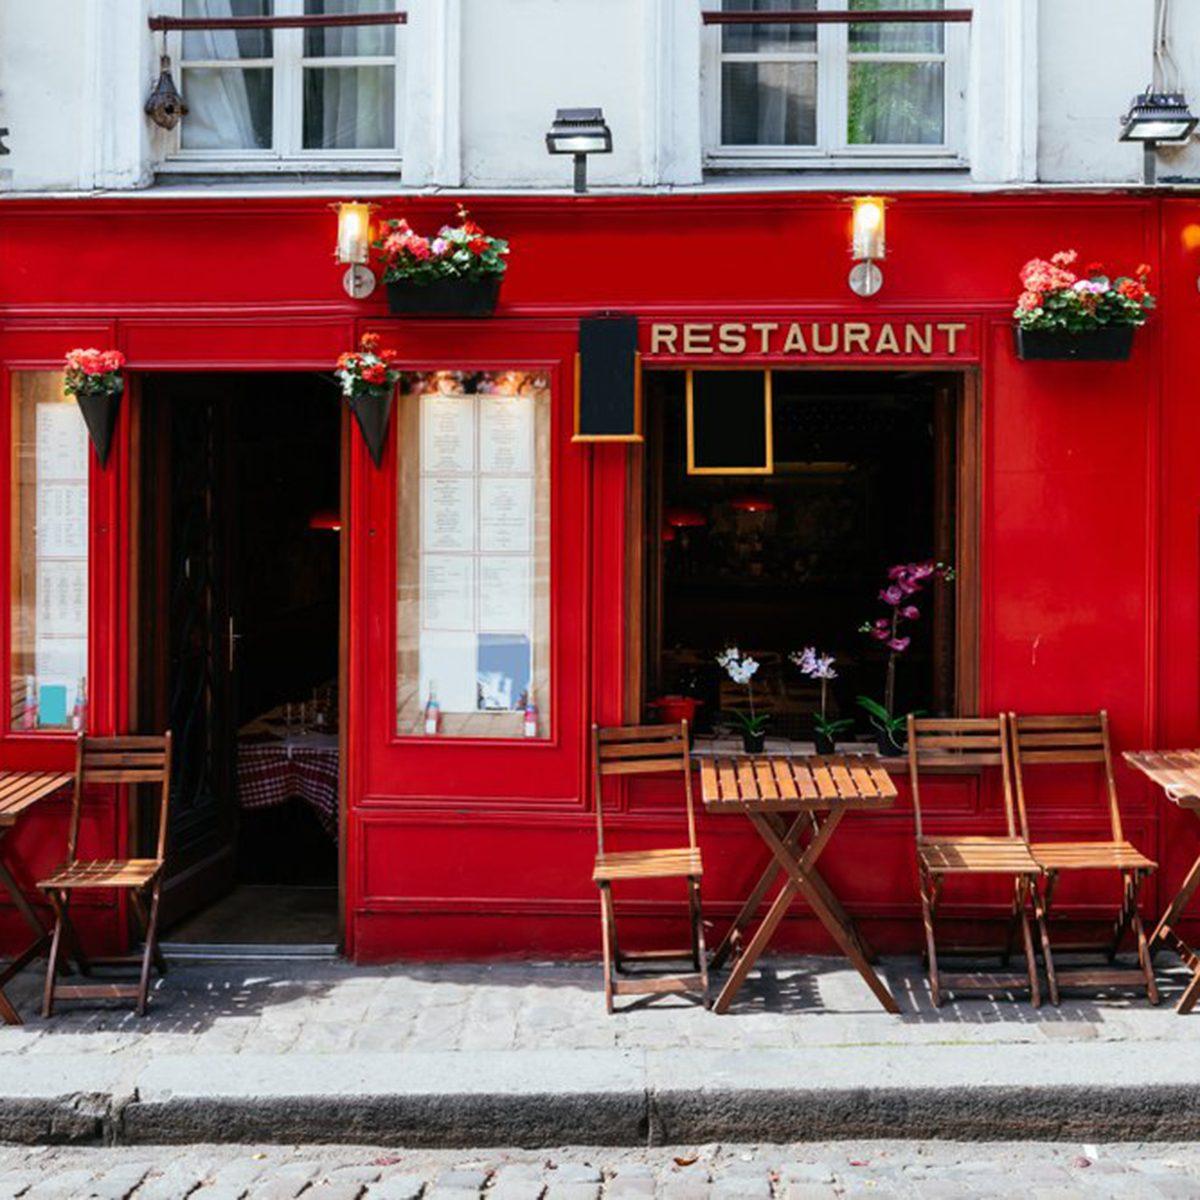 Bright red restaurant